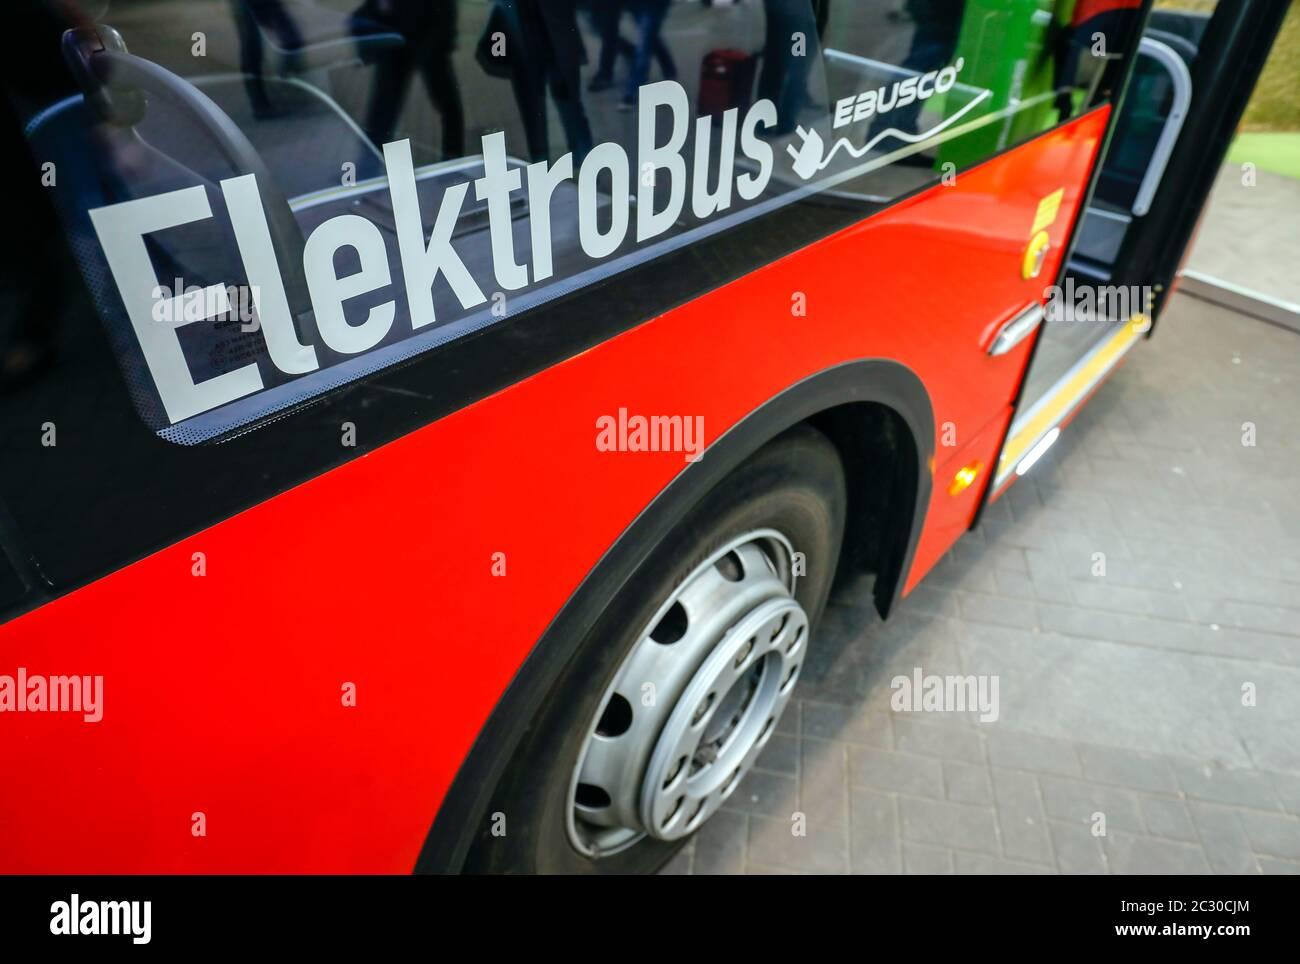 Elektrobus, exhibition stand at the E-world energy water trade fair, Essen, North Rhine-Westphalia, Germany Stock Photo